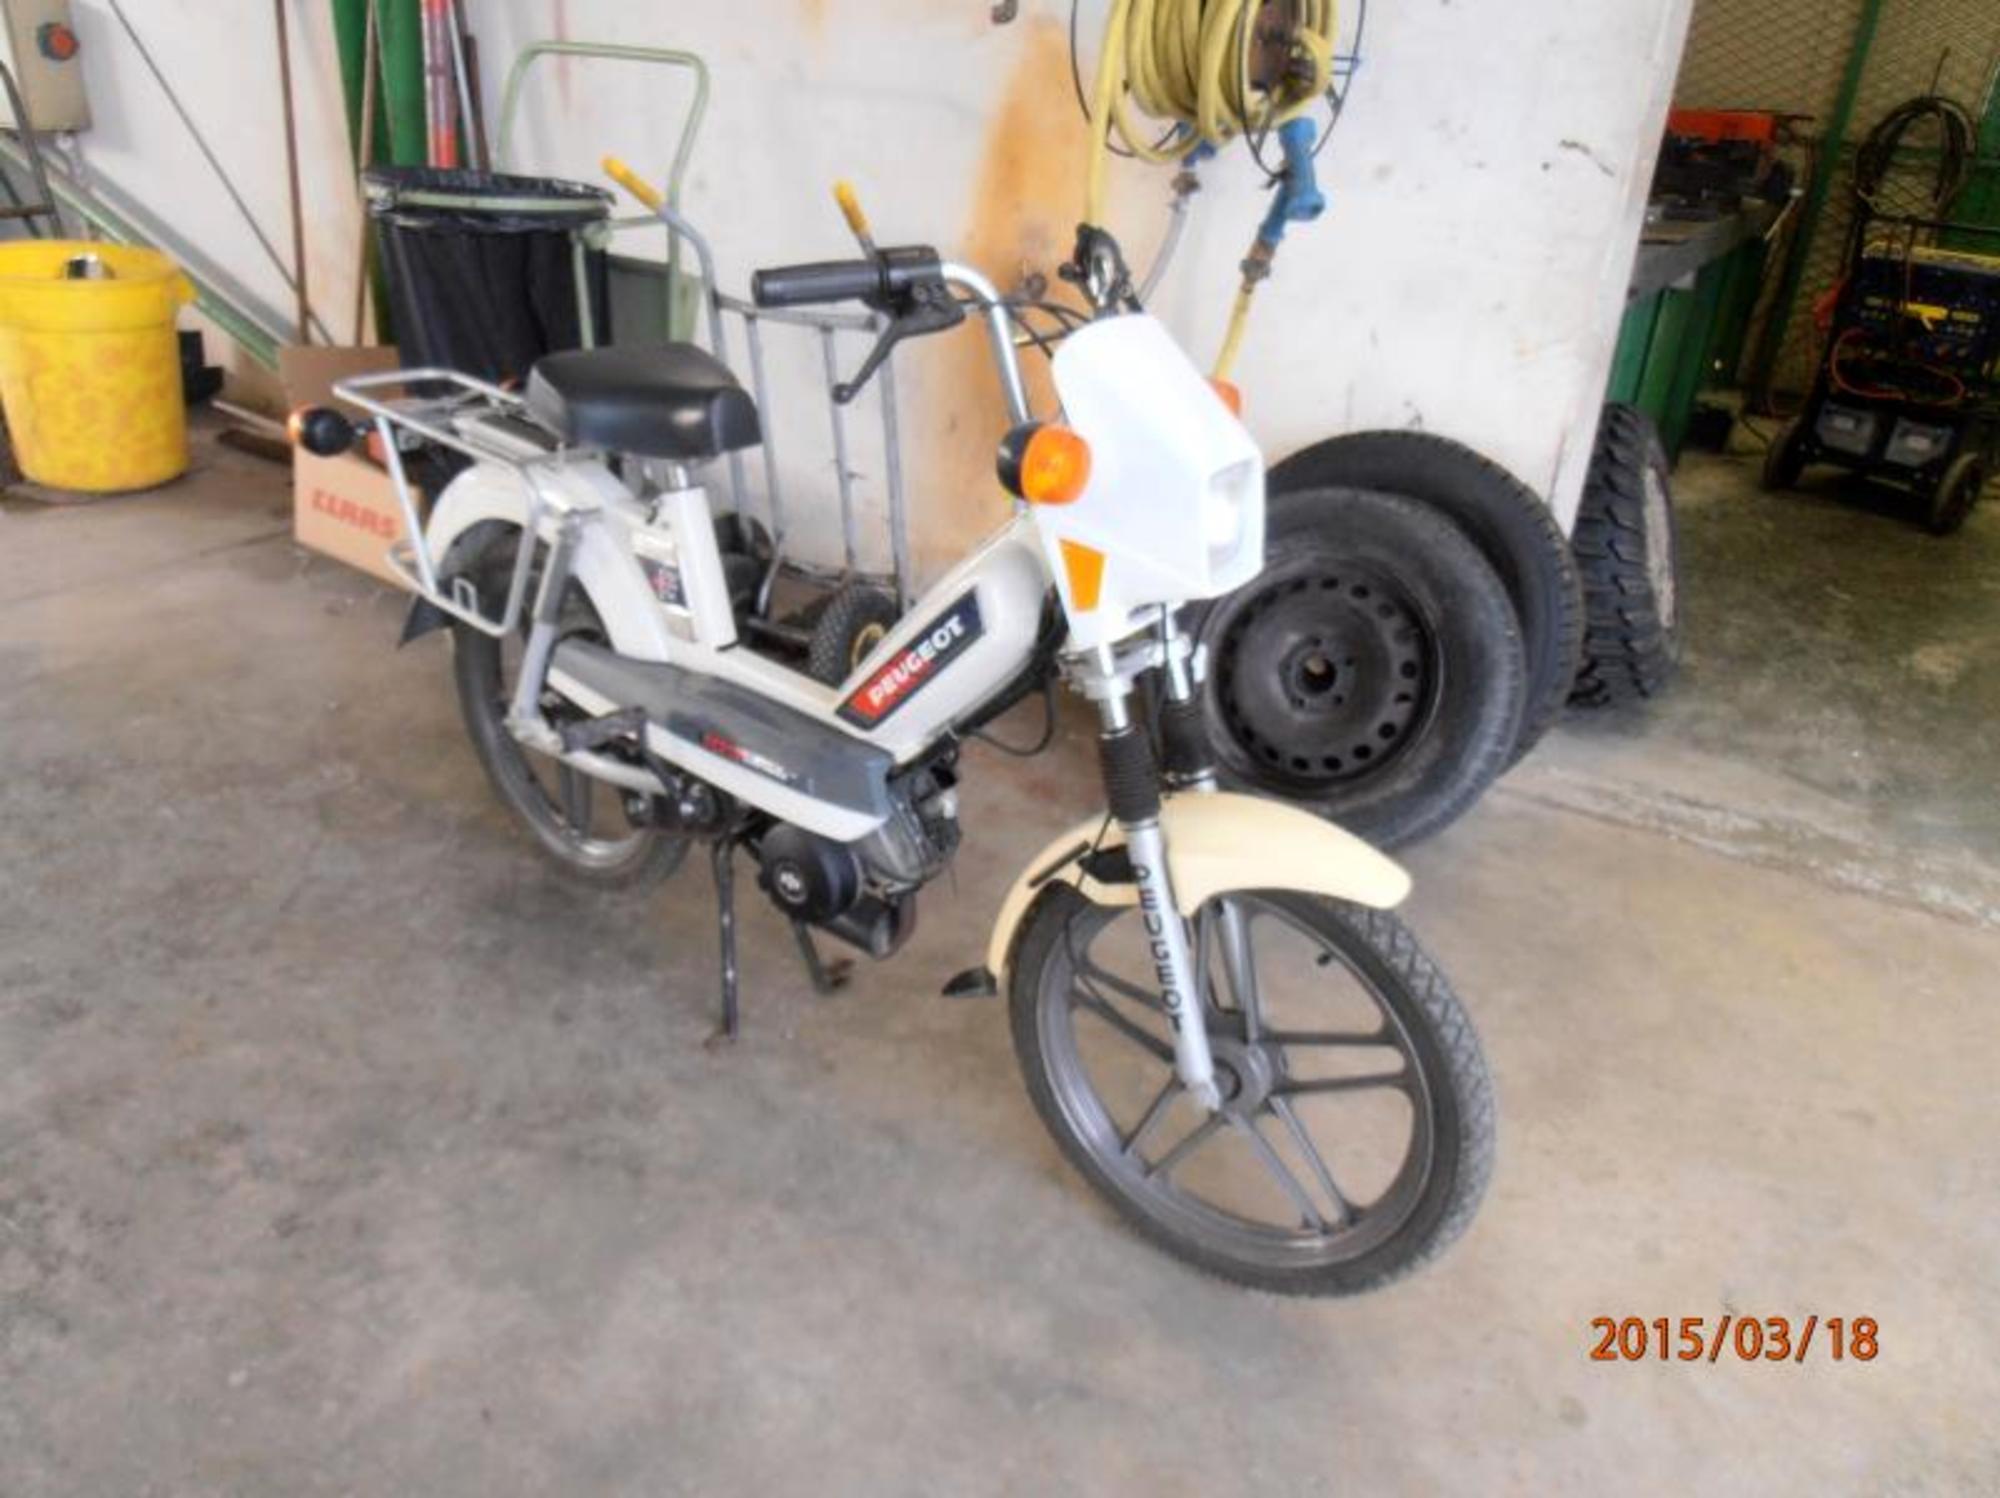 cyclomoteur peugeot 103 spx electronic moto scooter 2 roues d 39 occasion aux ench res. Black Bedroom Furniture Sets. Home Design Ideas